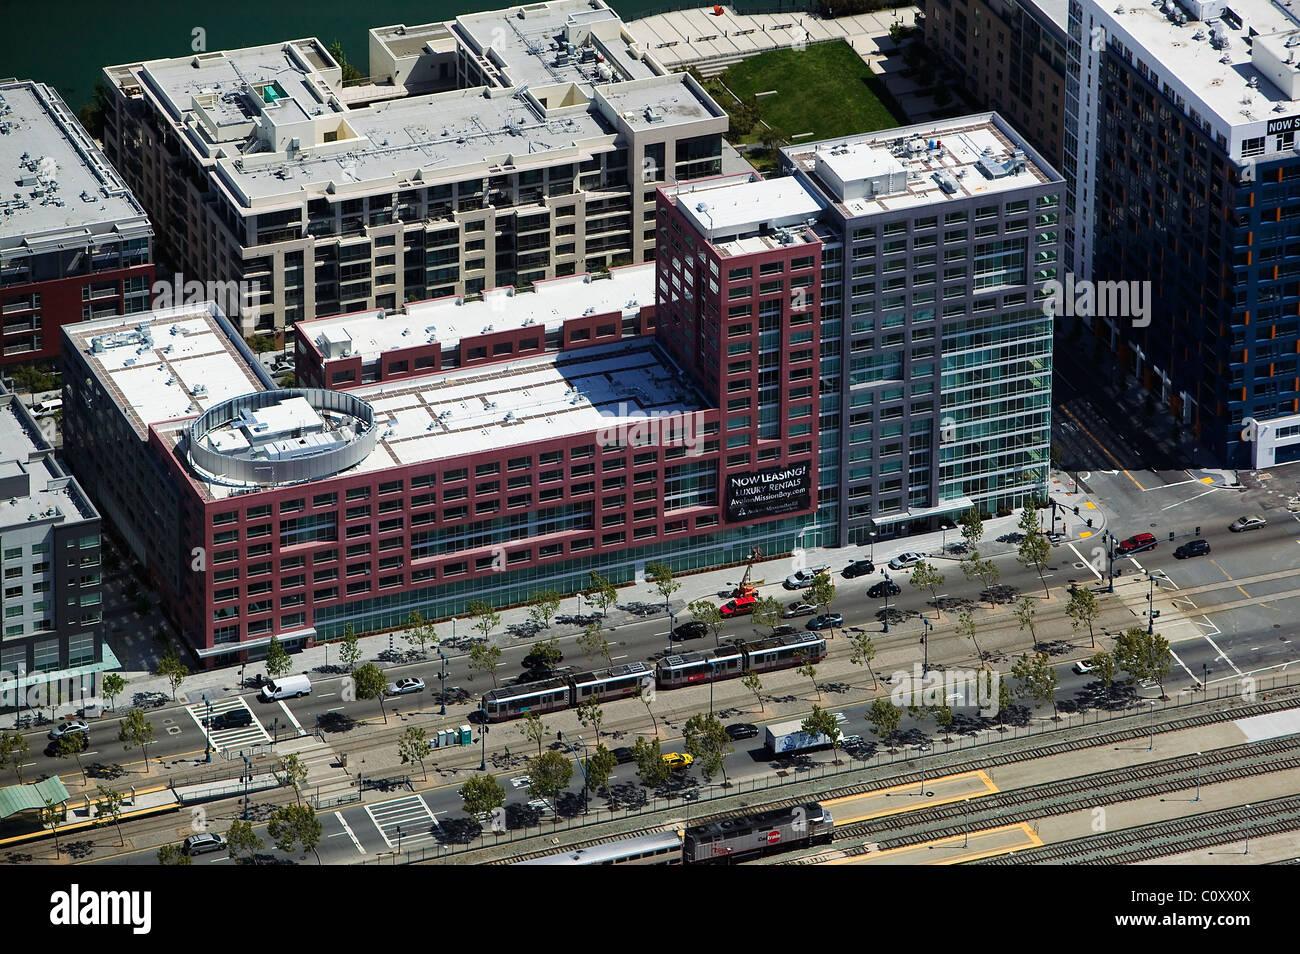 aerial view above San Francisco Muni Light Rail tracks trains at residential condominium buildings - Stock Image